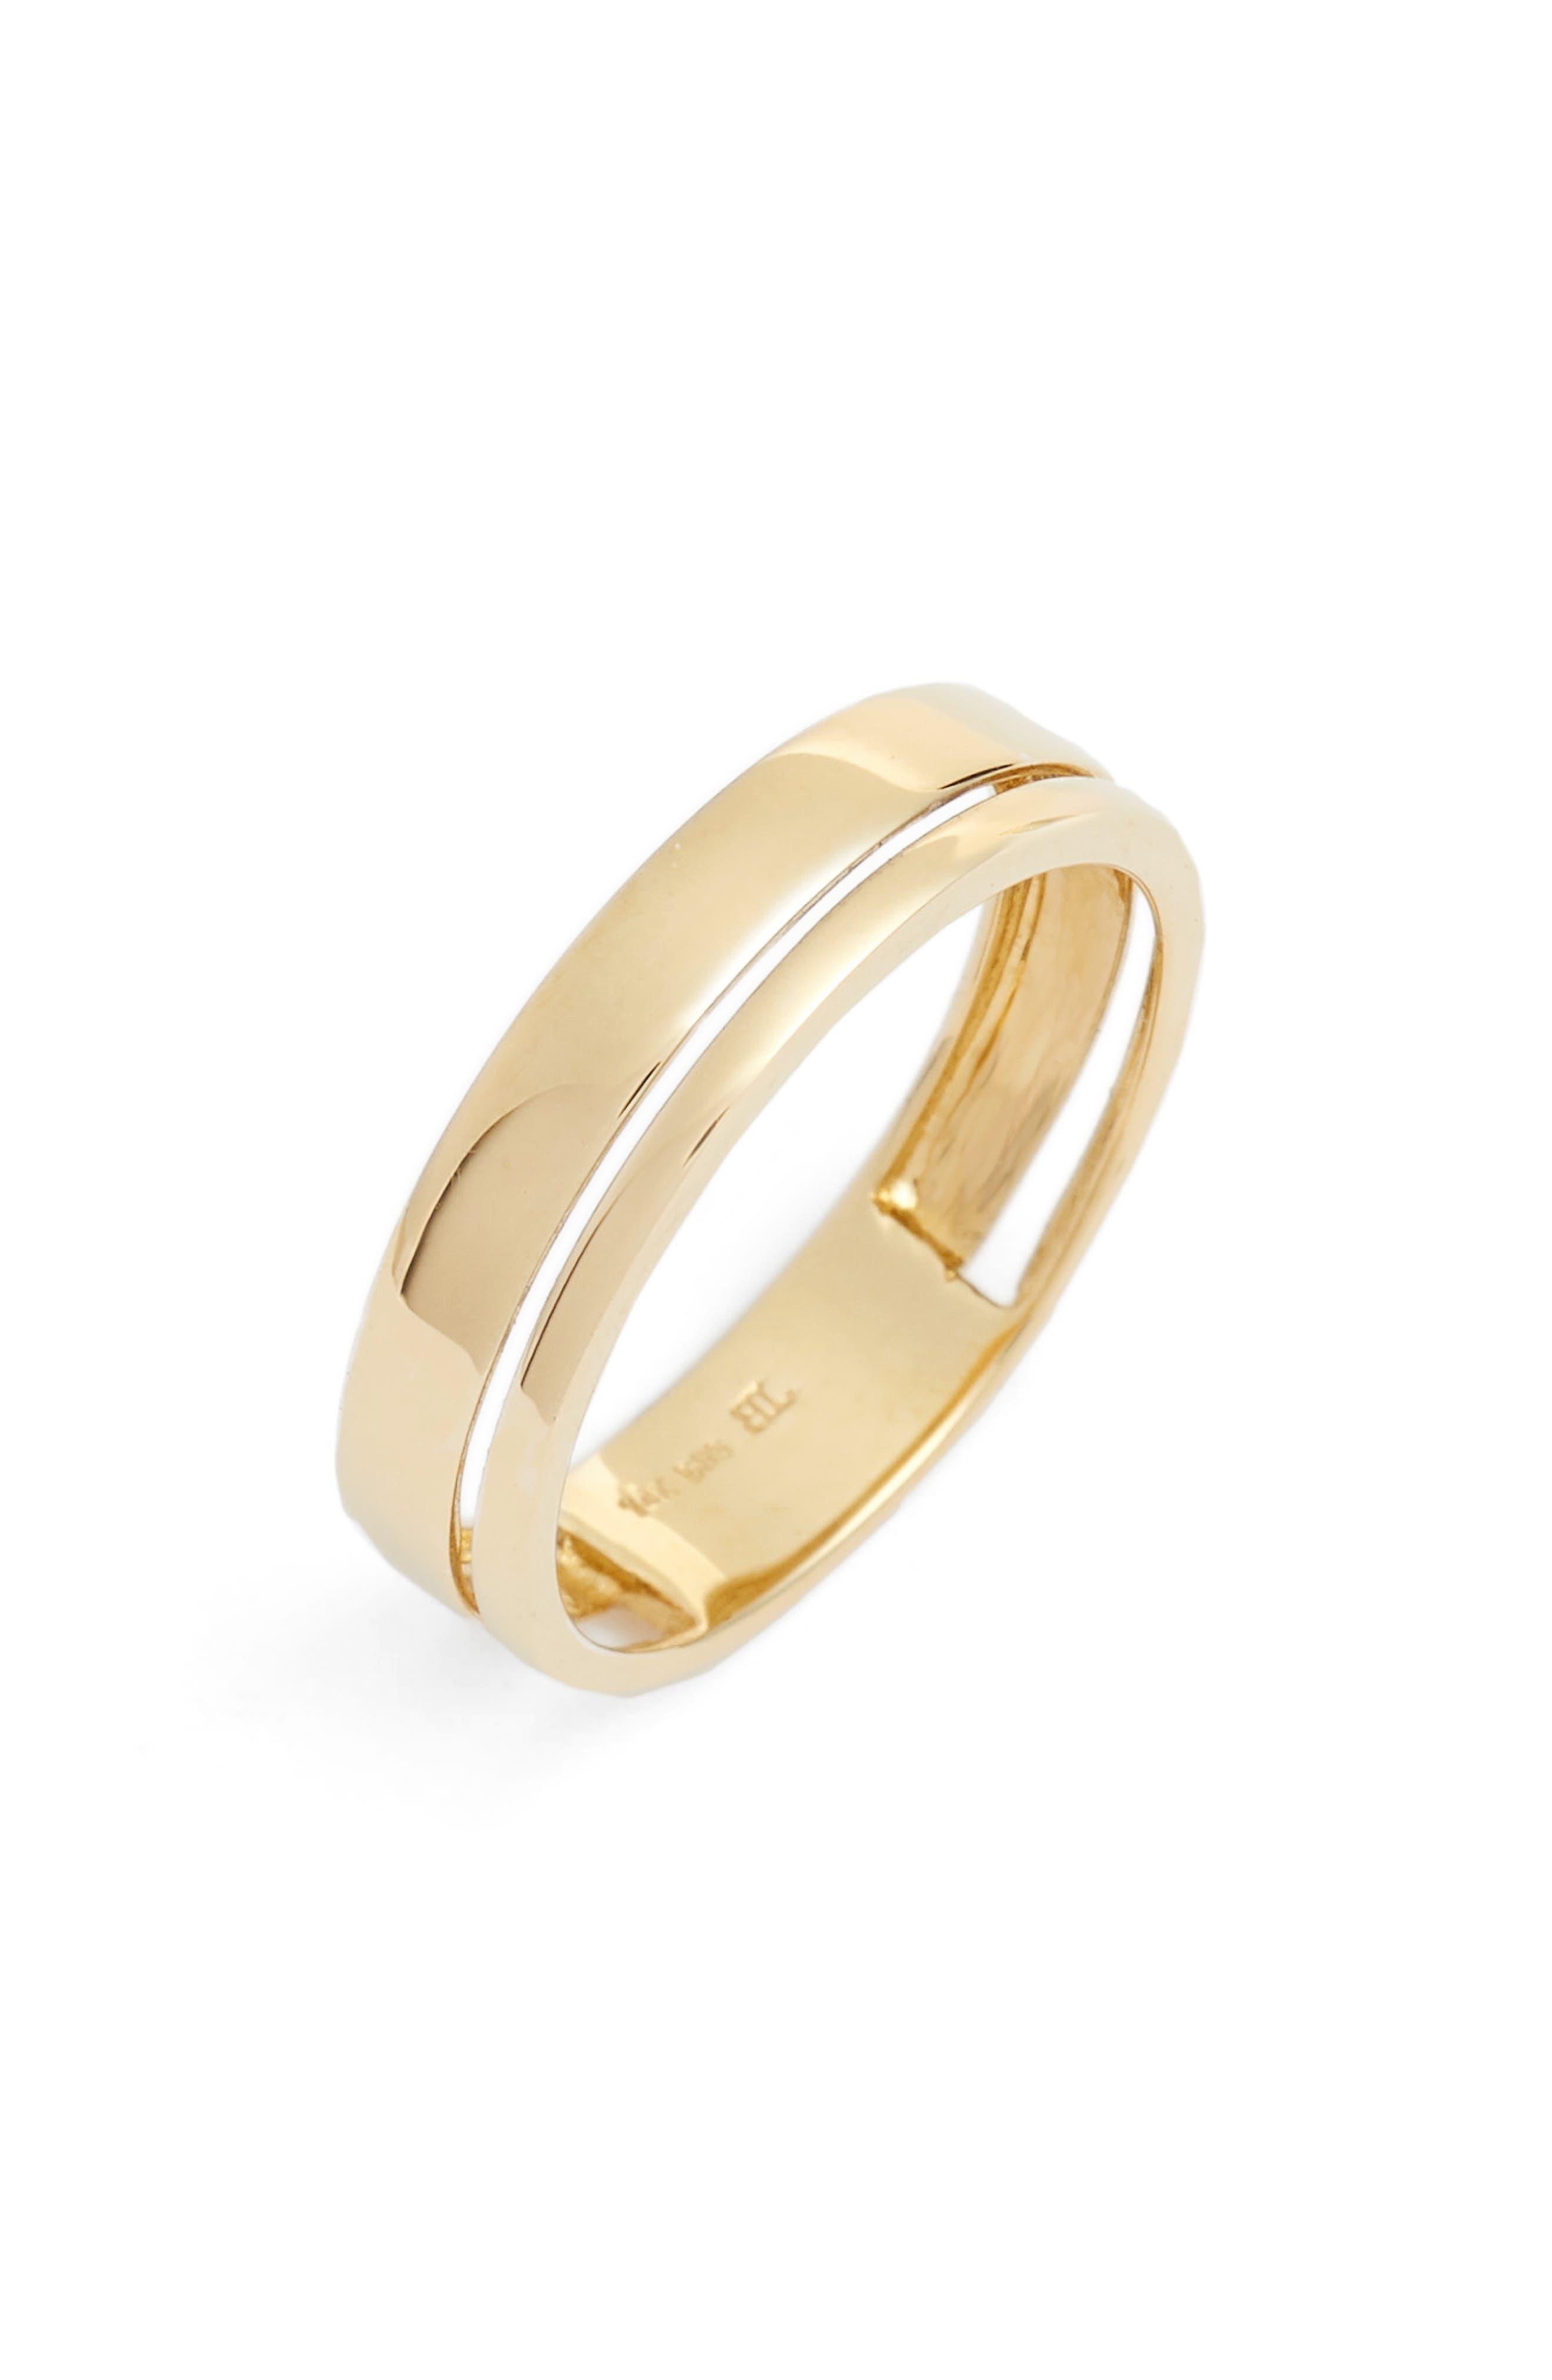 Split Band Ring,                             Main thumbnail 1, color,                             YELLOW GOLD